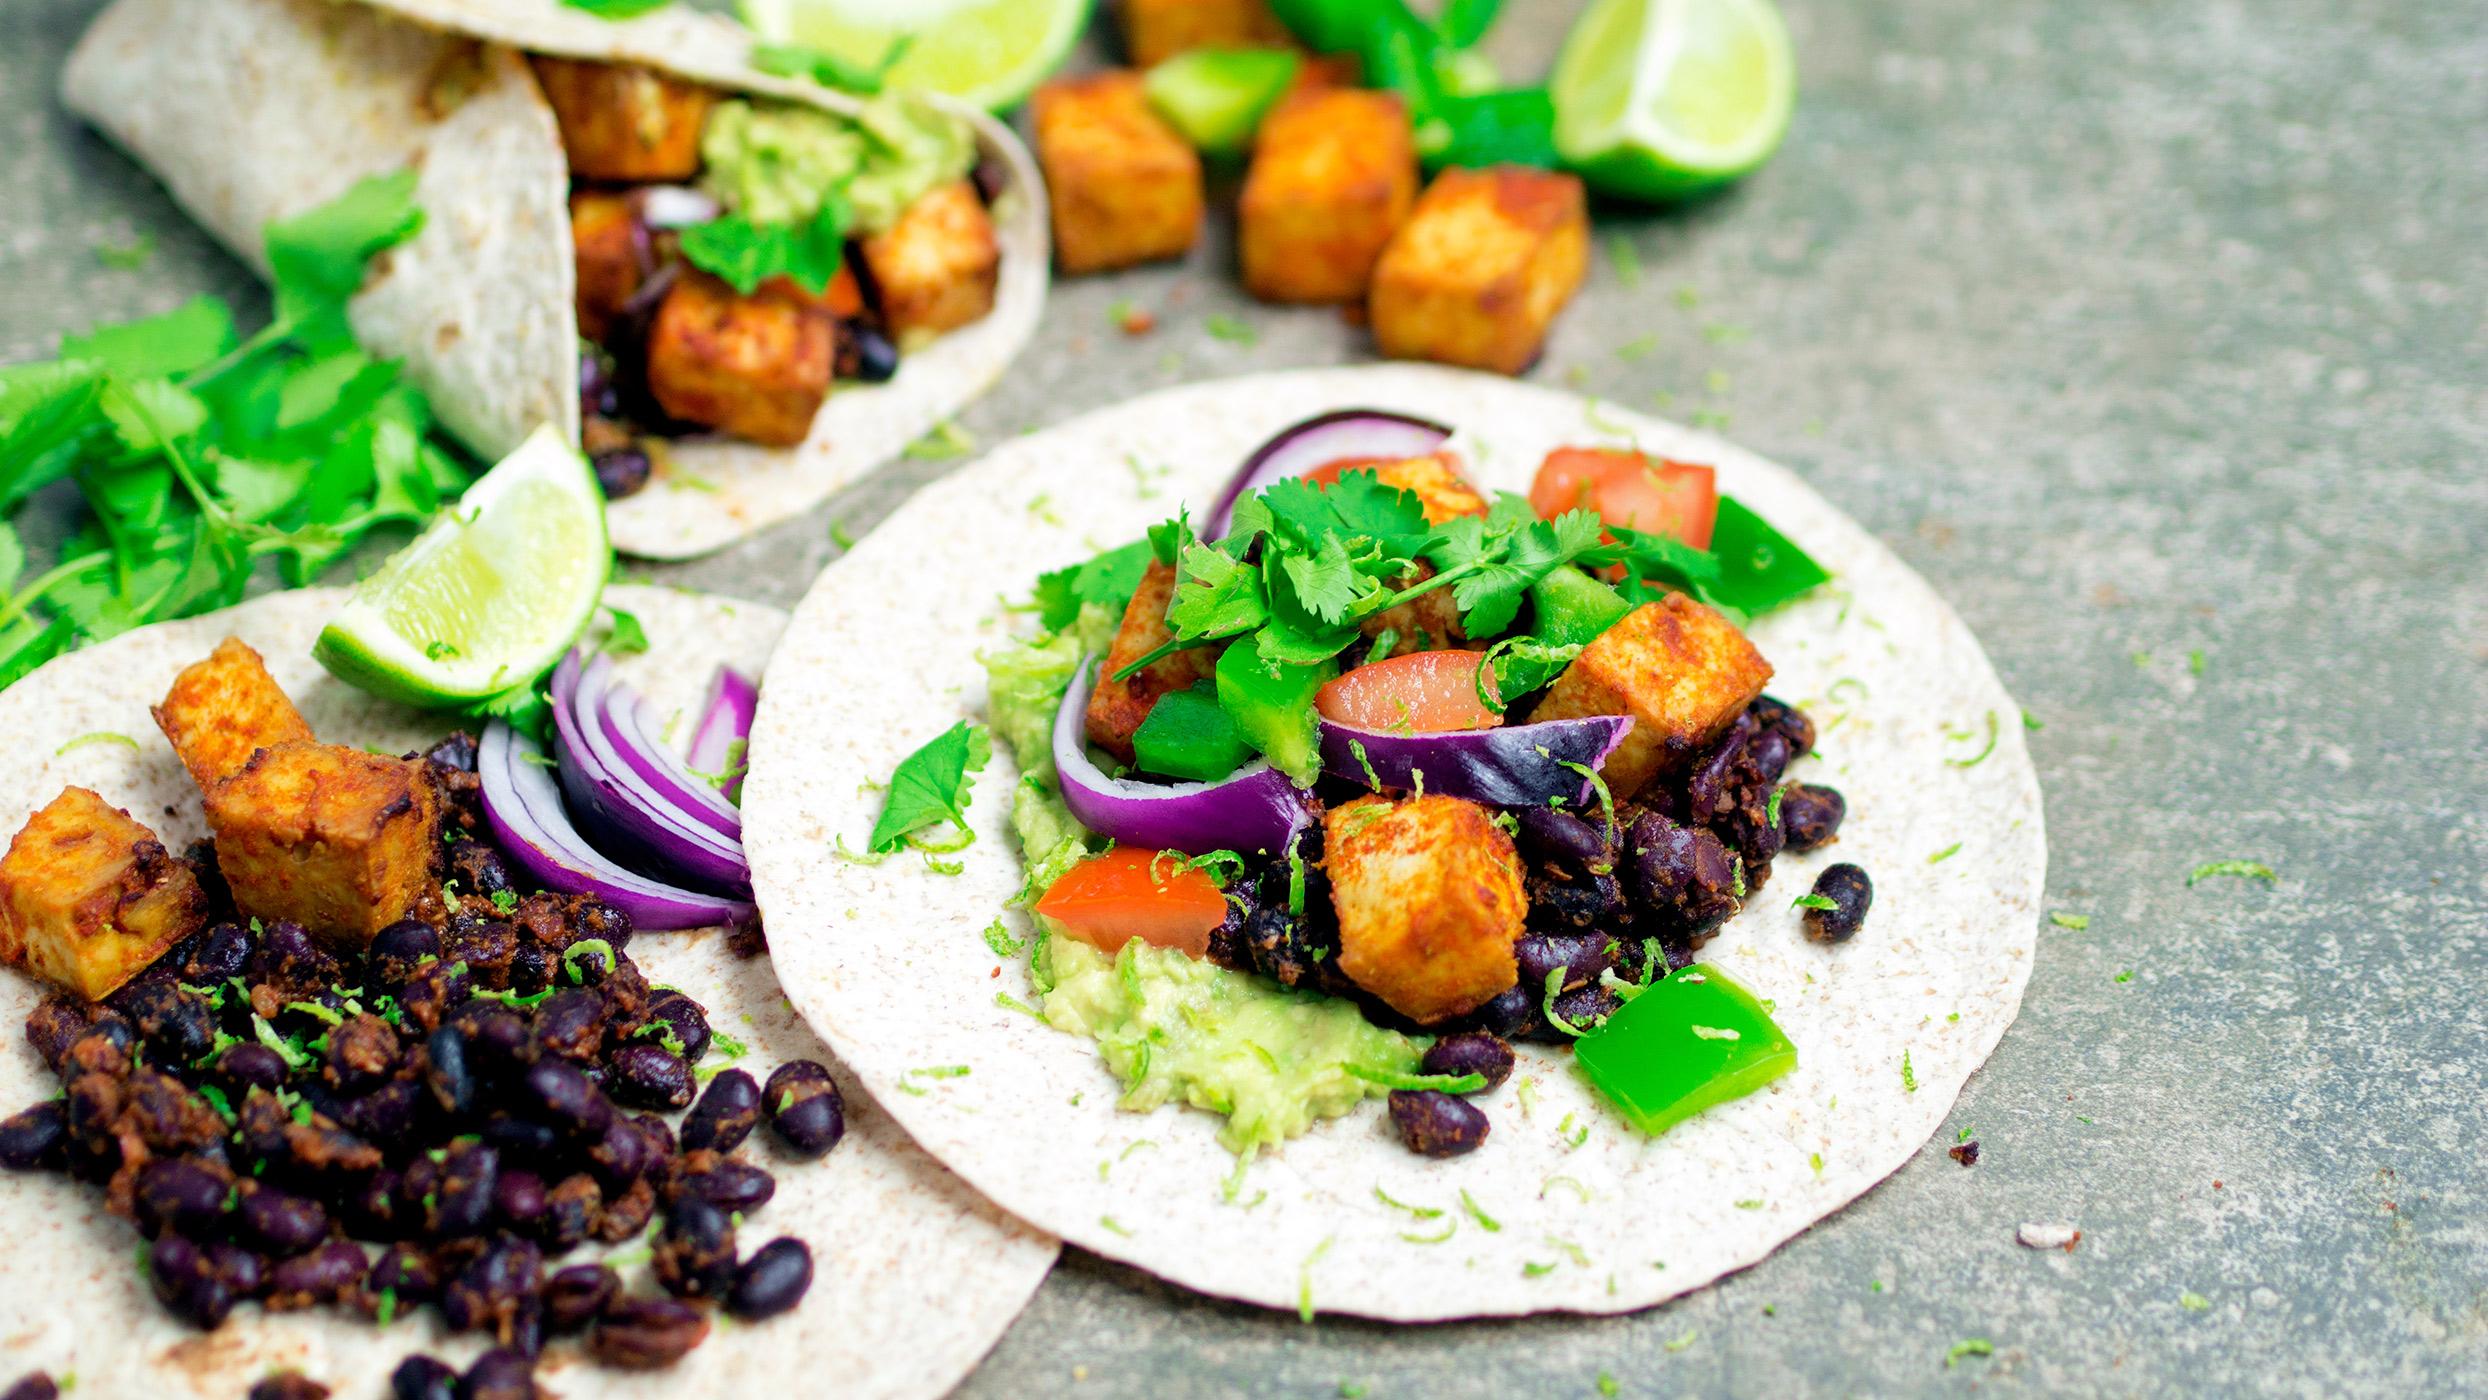 Vegan recipe video: Here's how to make Mexican tofu and black bean wraps